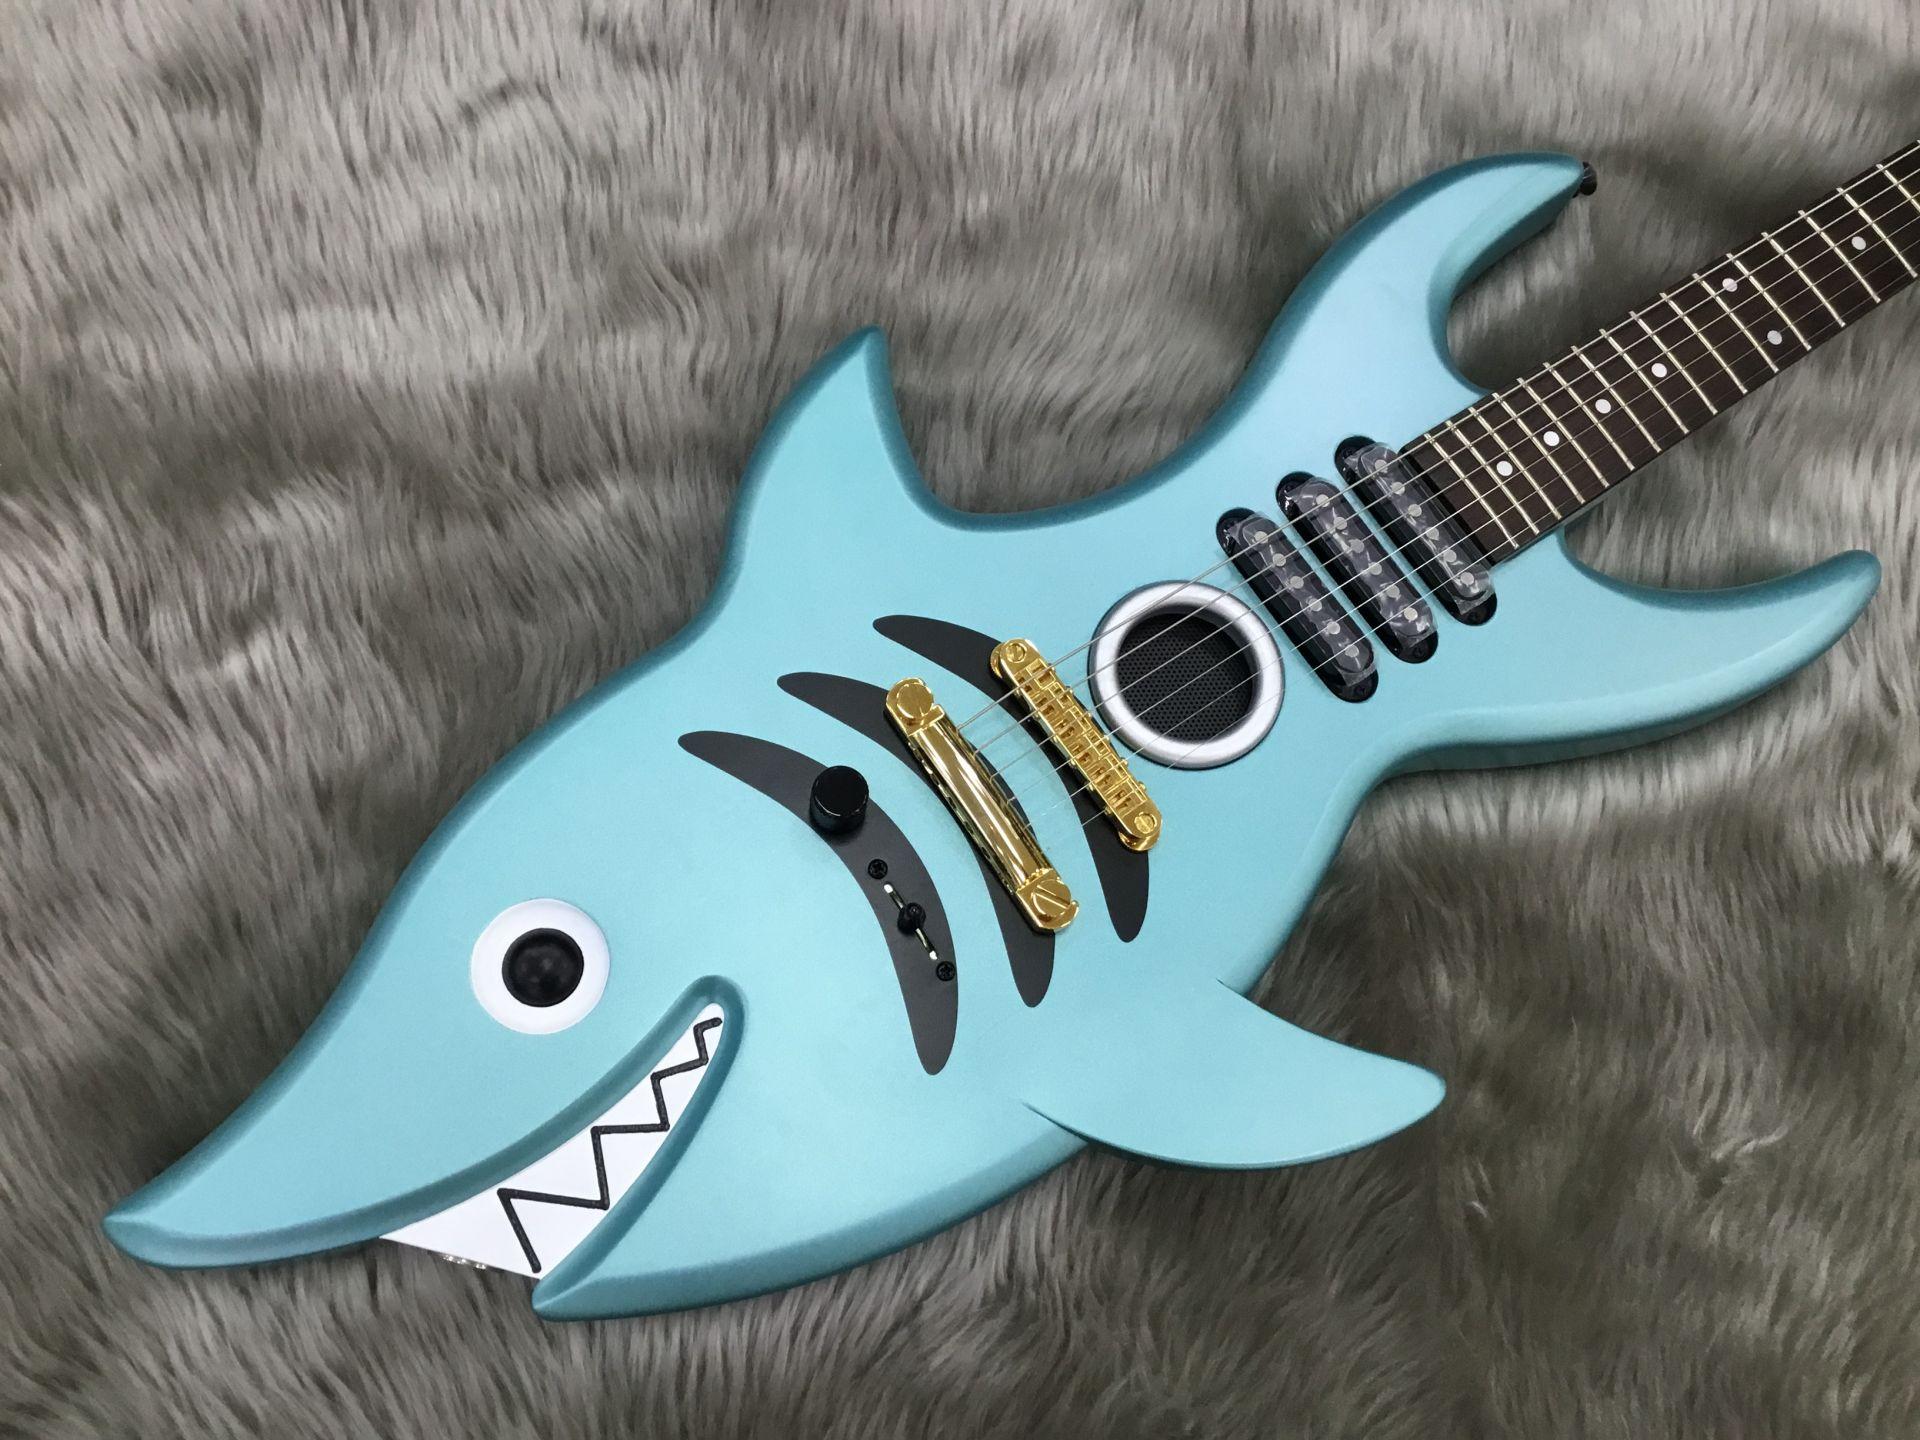 SHARK GUITARの全体画像